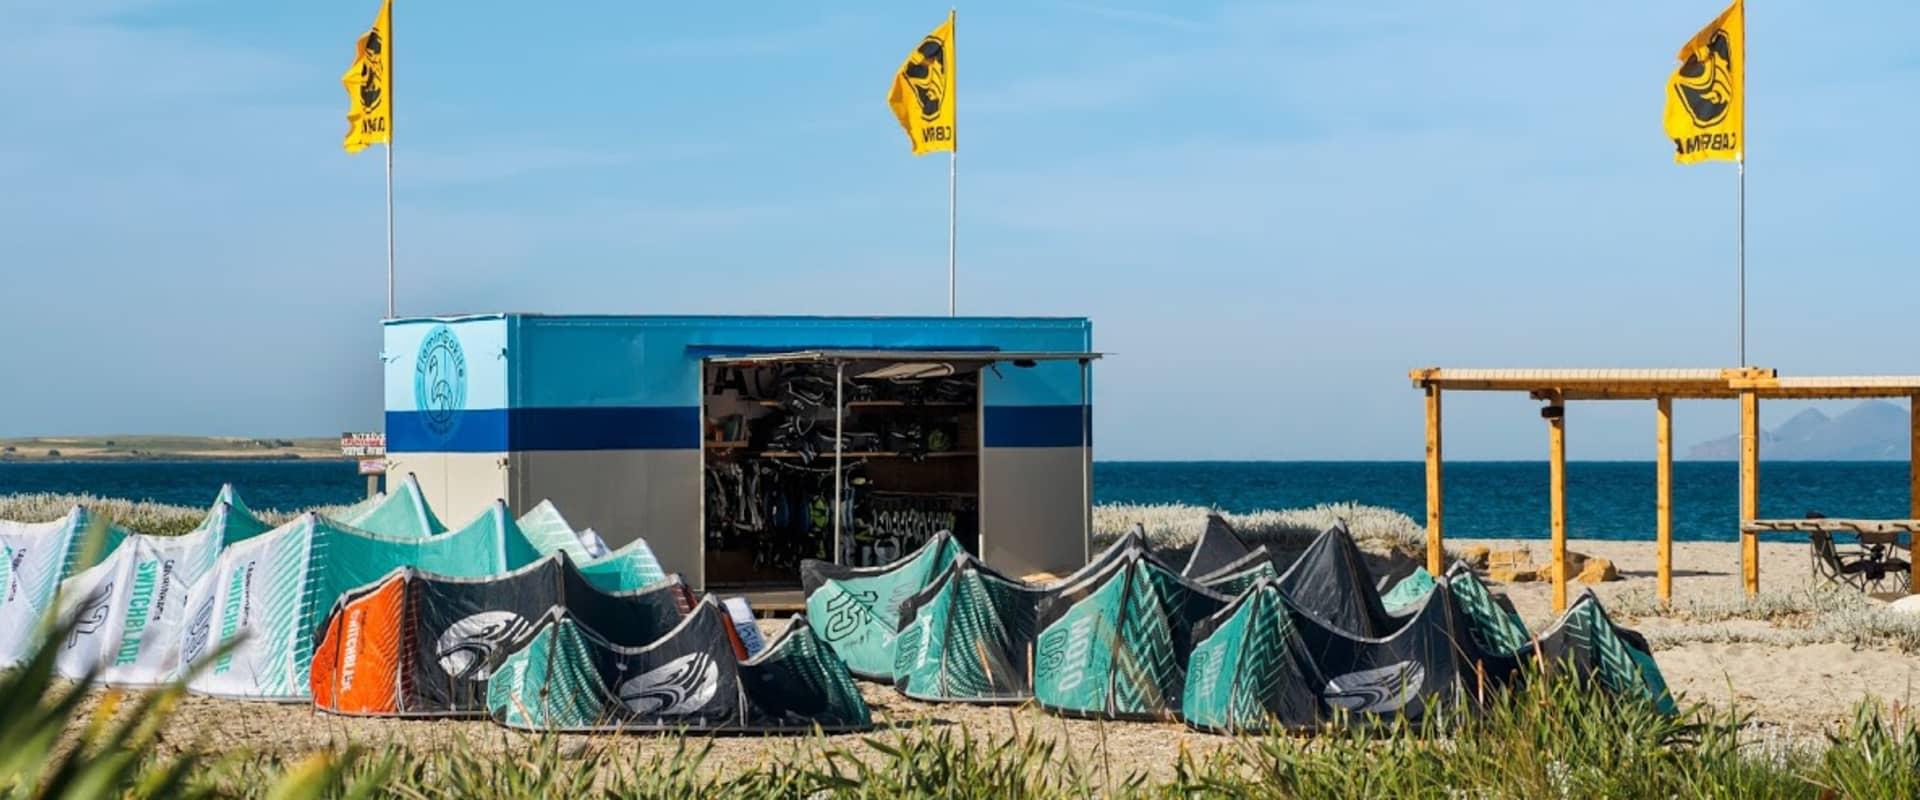 FlaminGokite Station at Aliki beach, Limnos island with new cabrinha 2021 kites